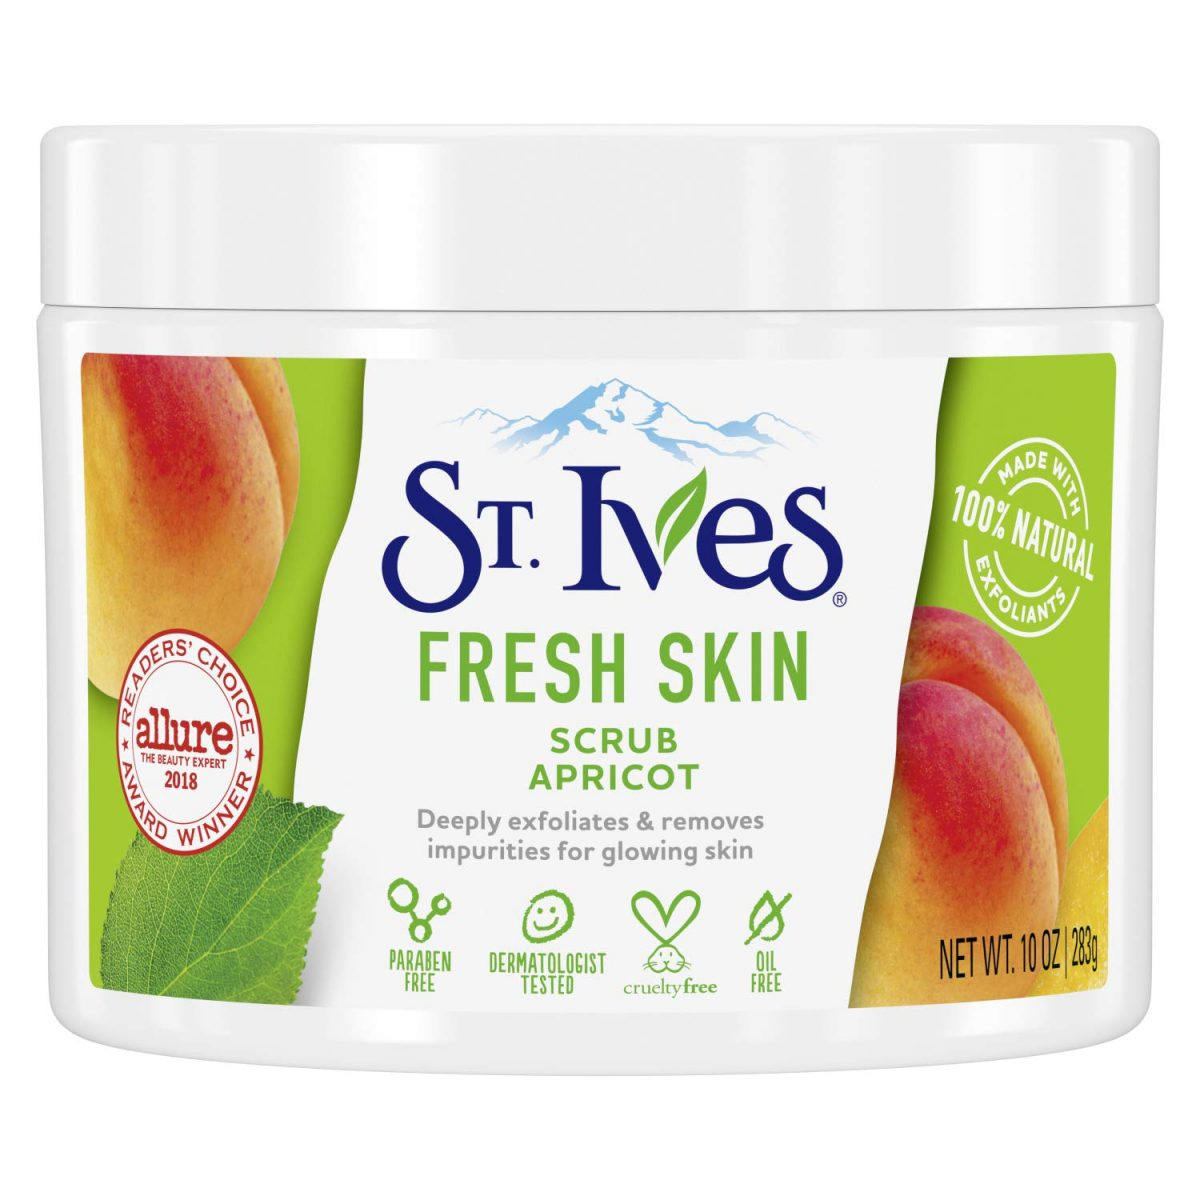 St.Ives Apricot Scrub Jar USA 283g